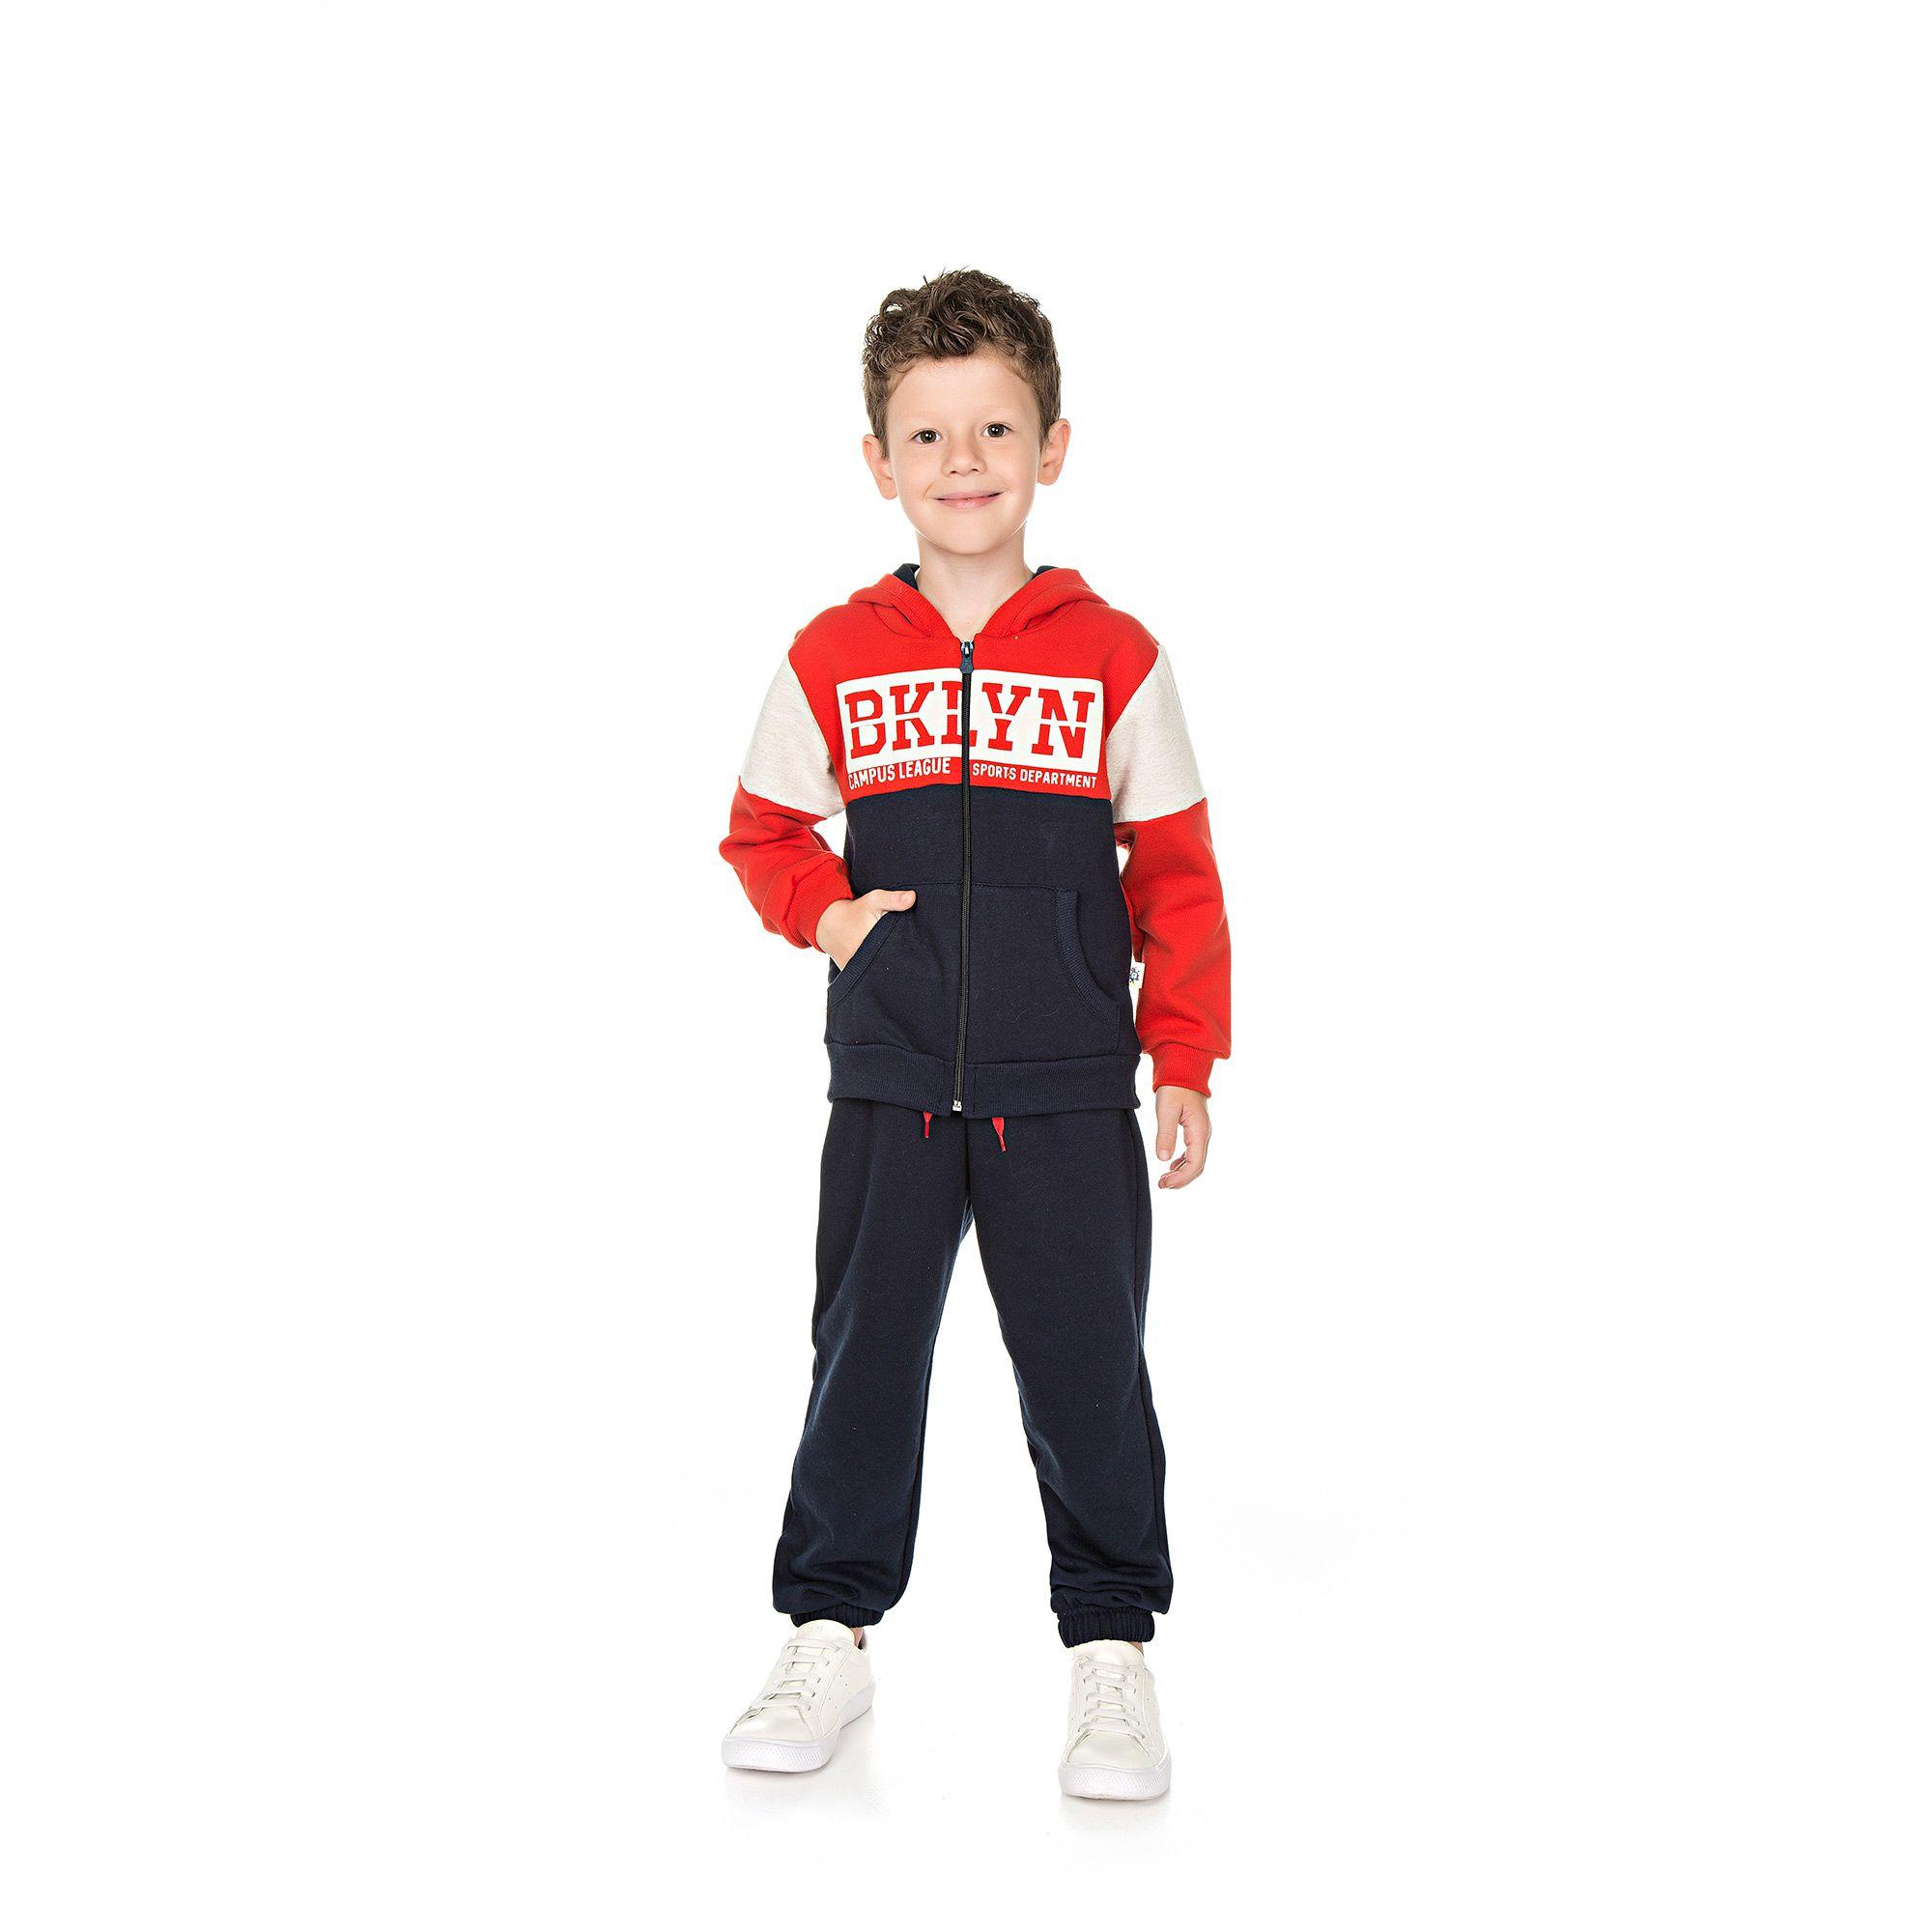 Conjunto Infantil Masculino  - Ref 5018 - Vermelho/Marinho